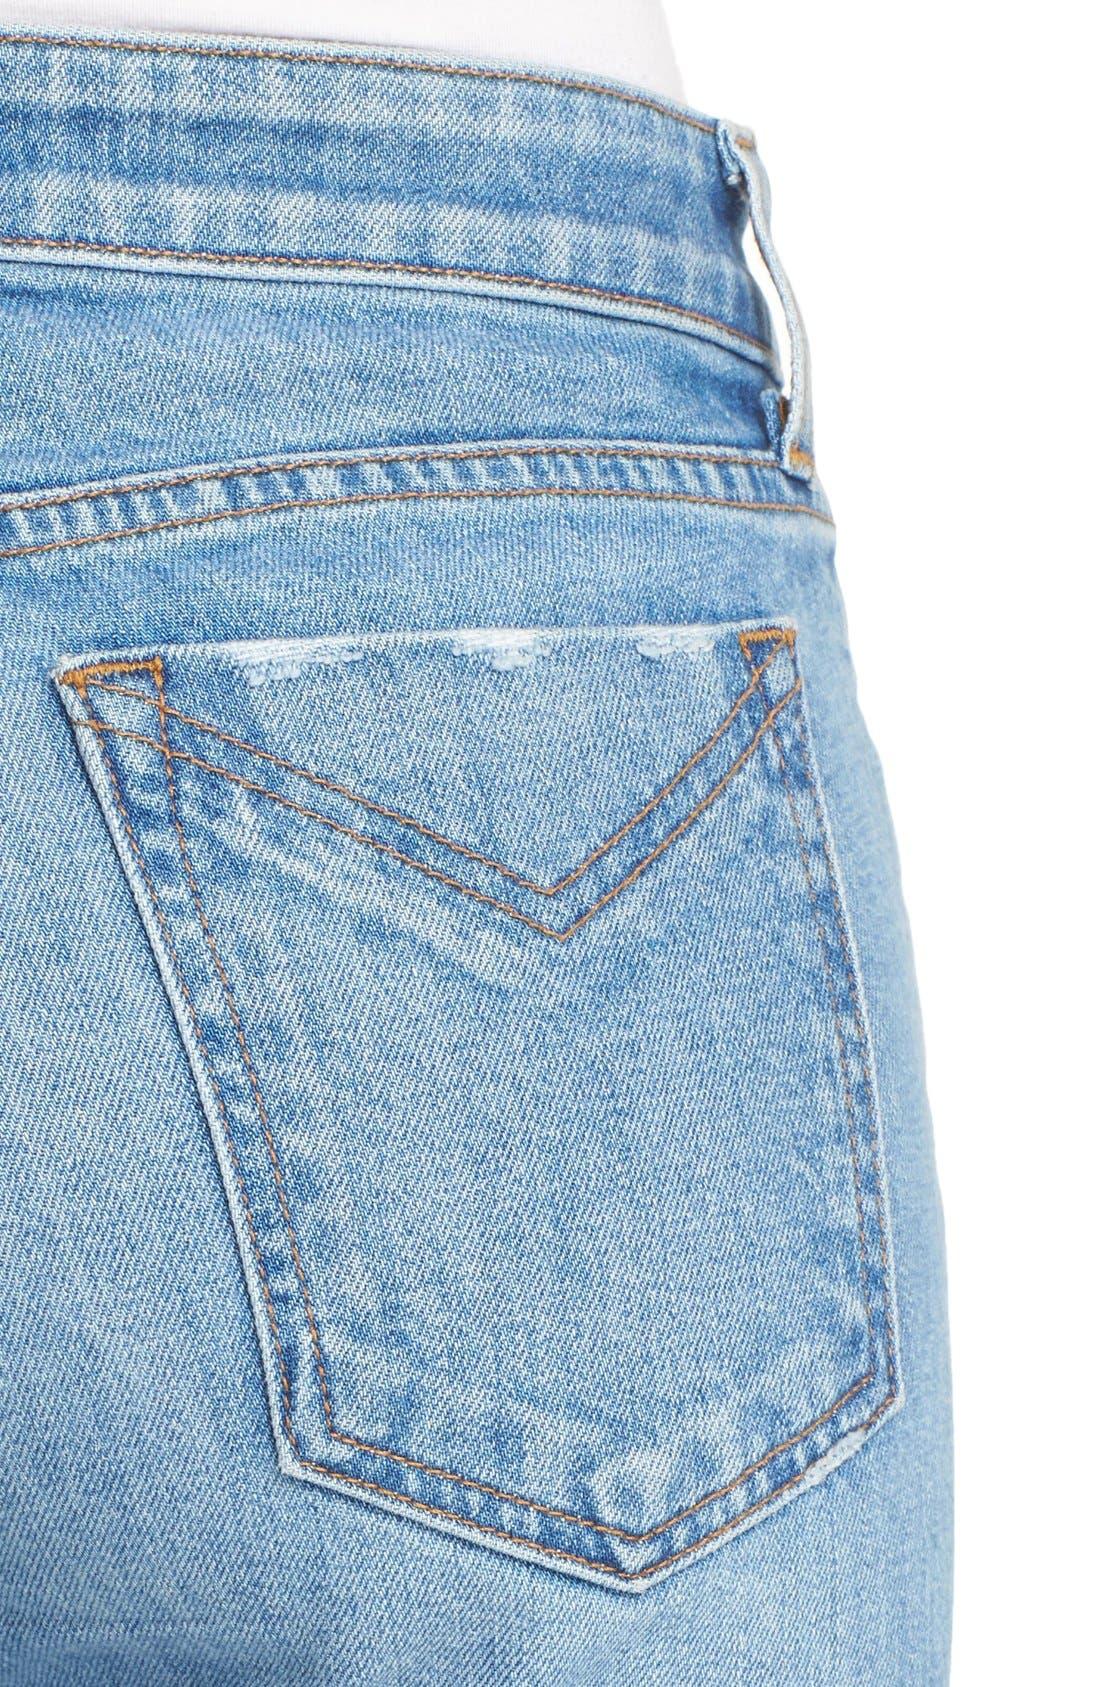 Alternate Image 4  - Derek Lam 10 Crosby 'Gia' Crop Flare Jeans (Light Wash)